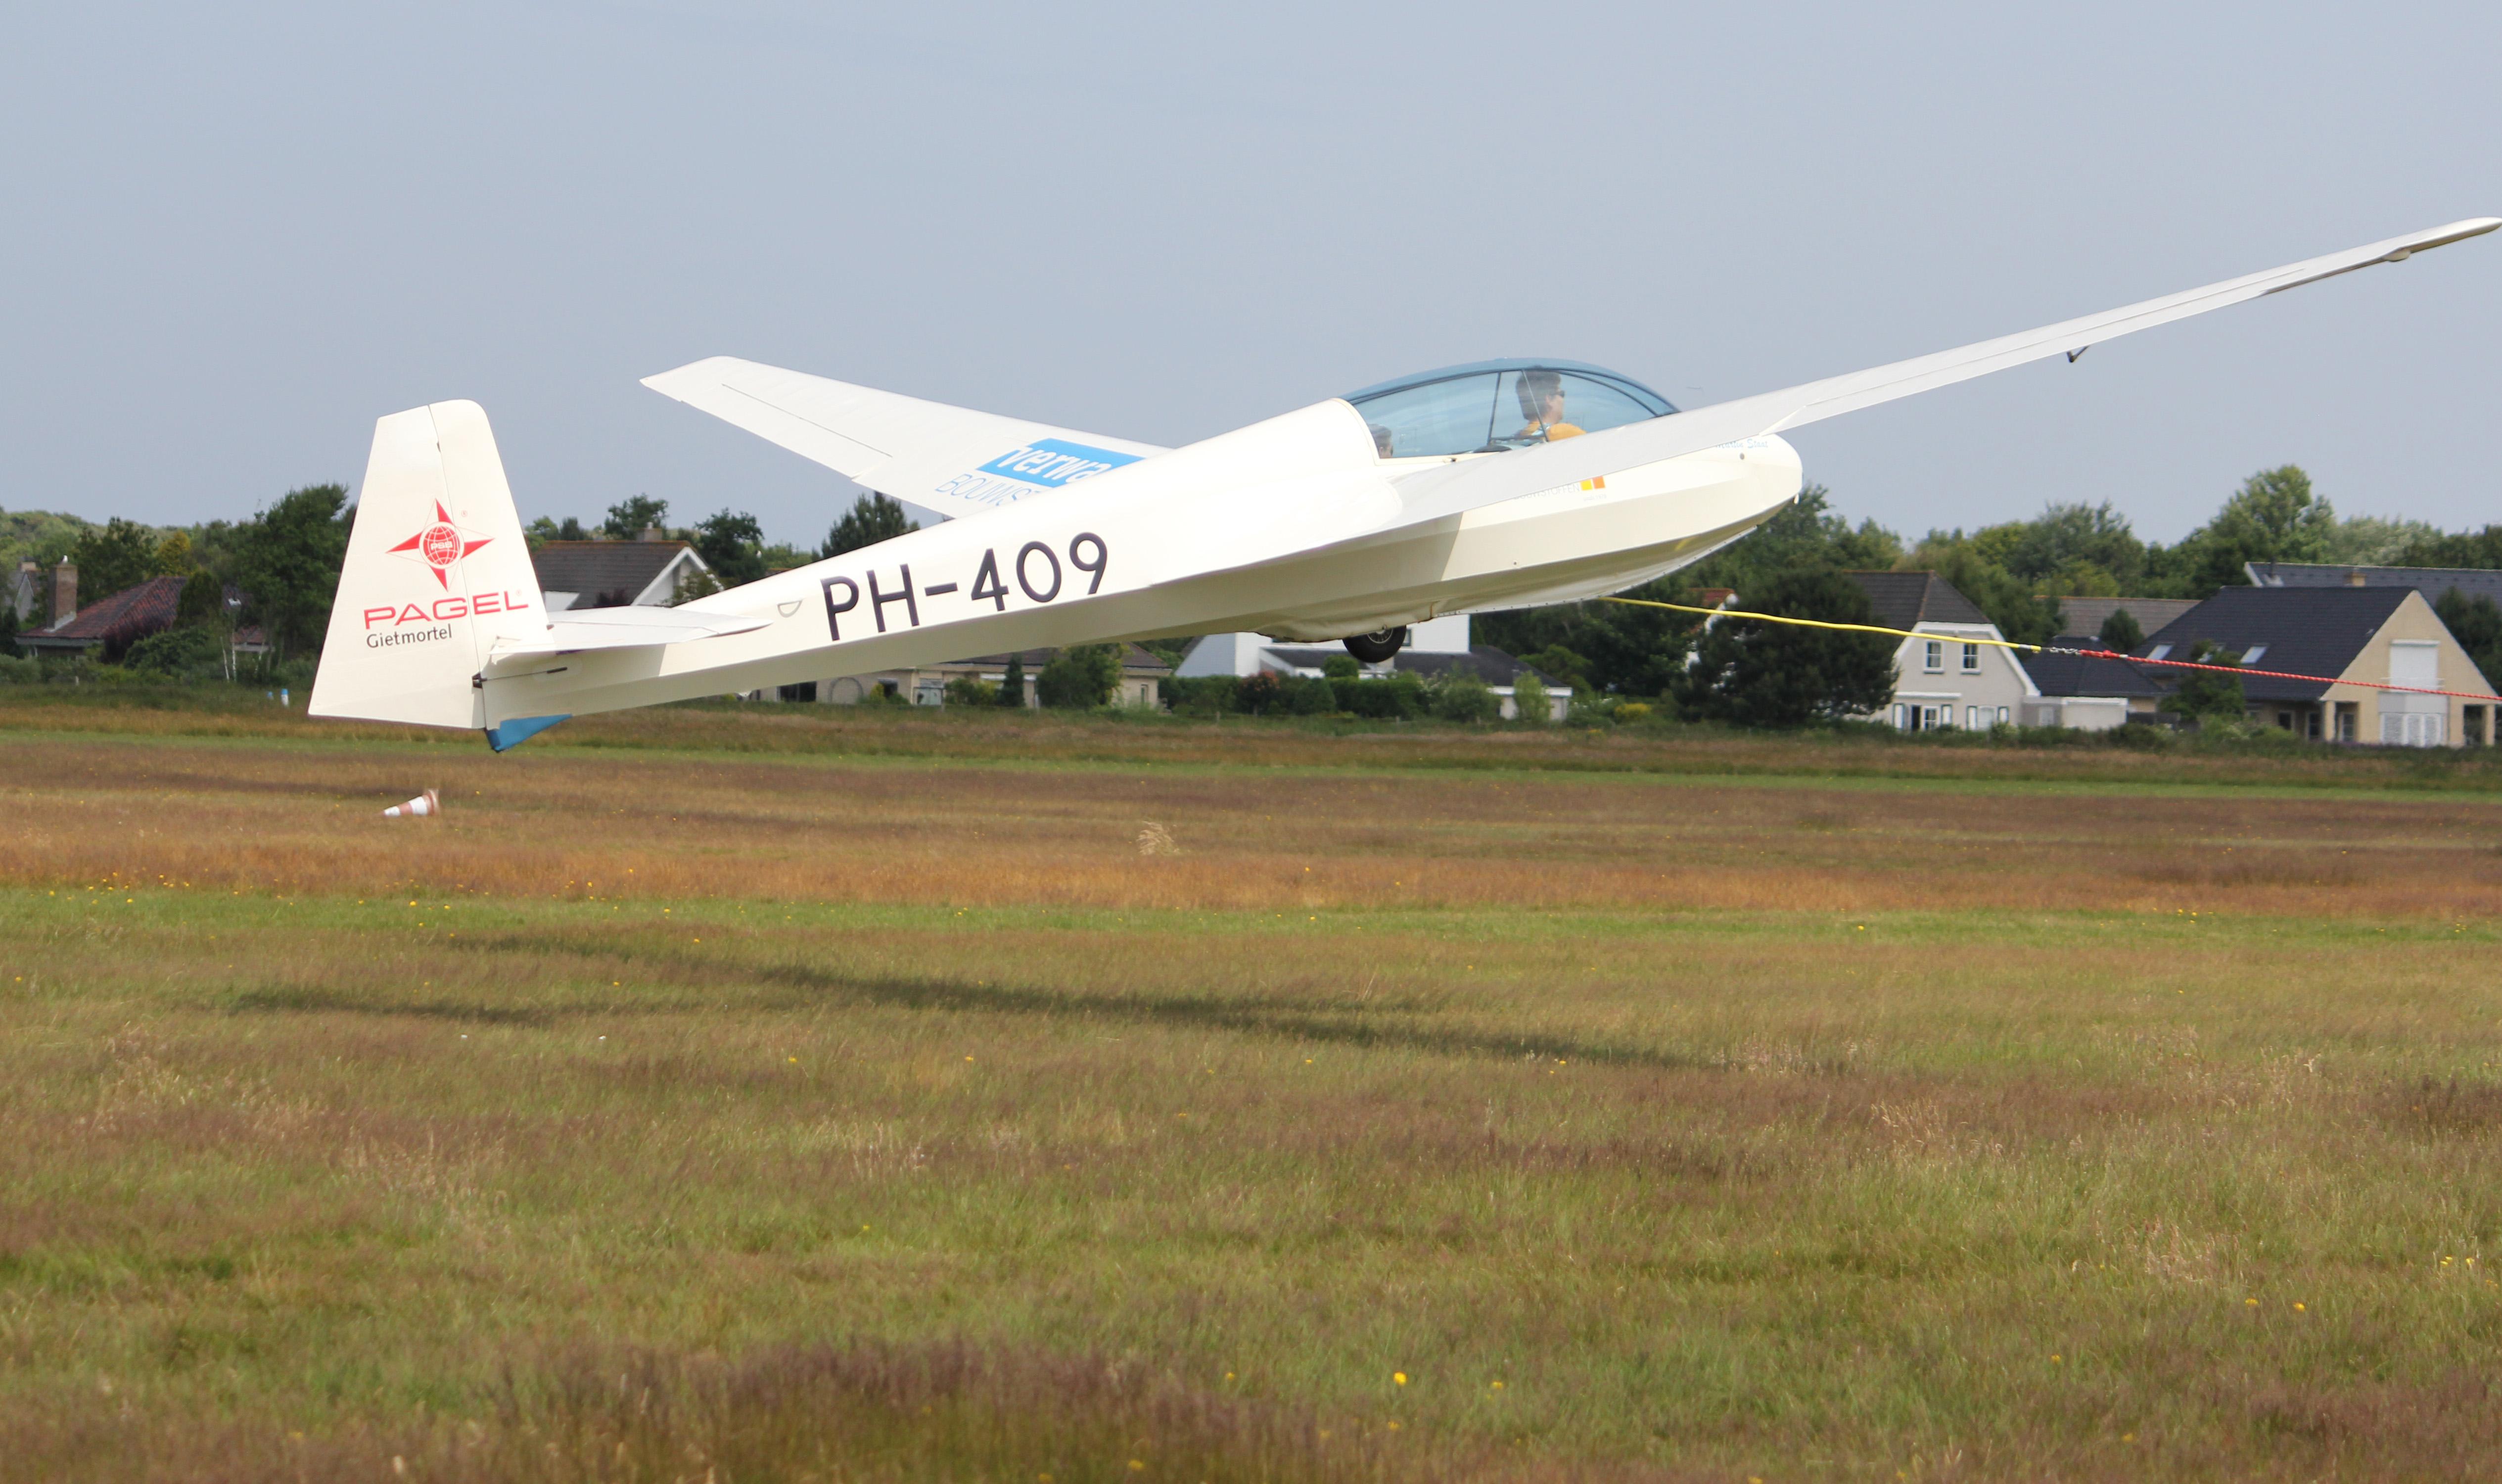 PH-409-Knip